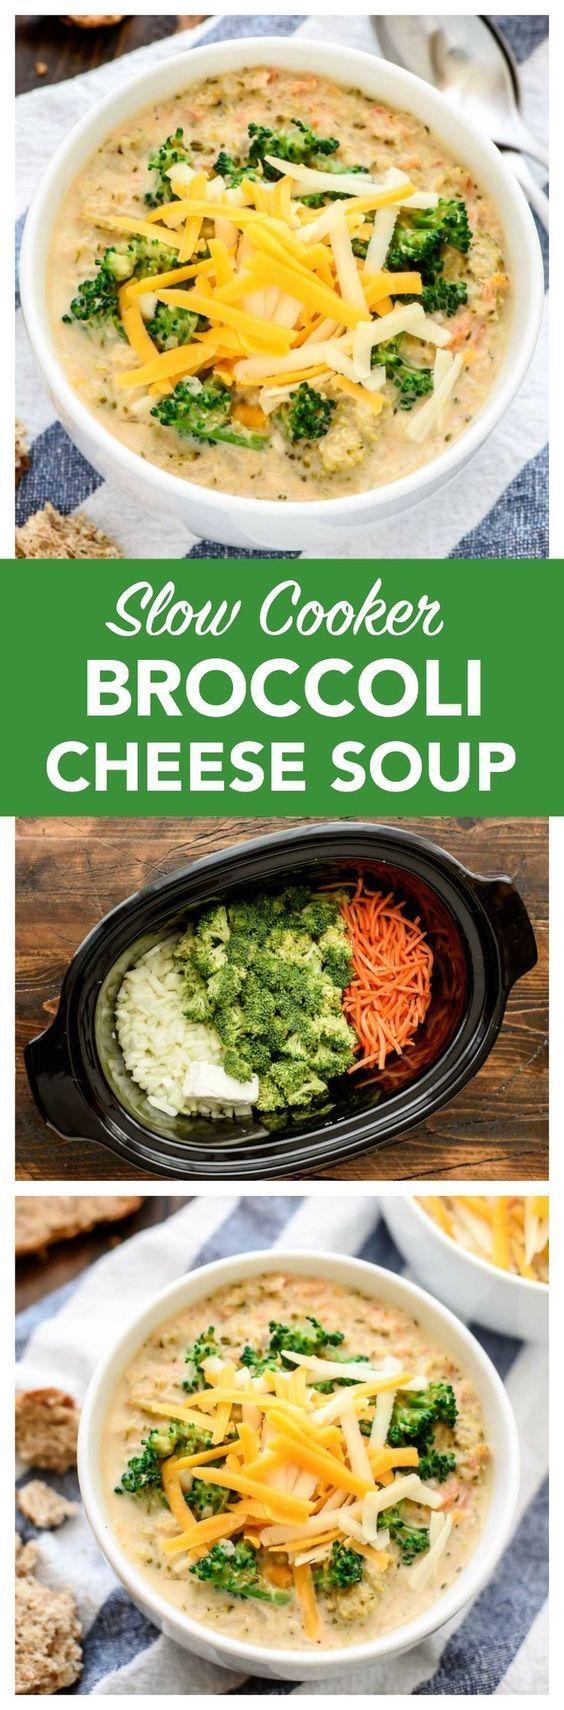 healthy broccoli cheese soup